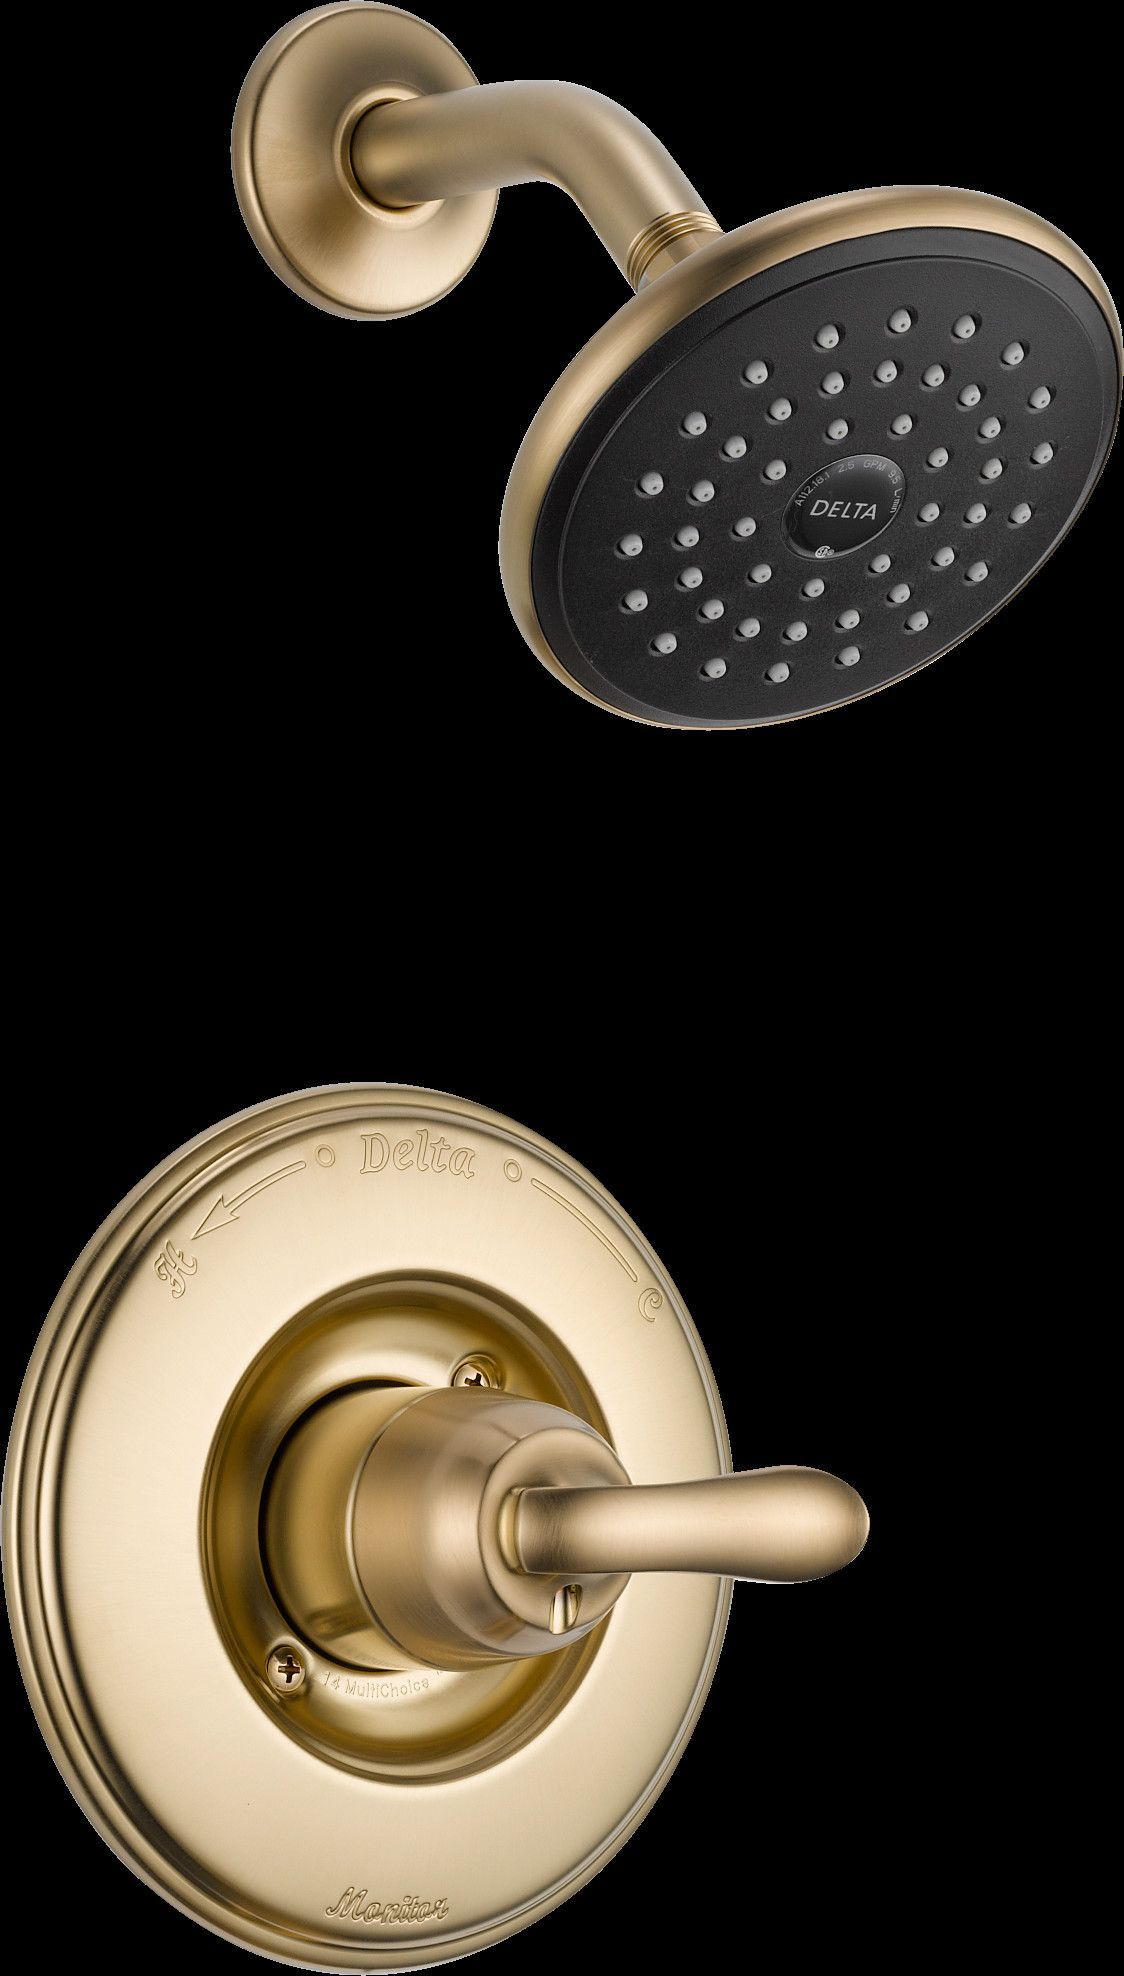 Linden Shower Faucet Trim with Lever Handles | Products | Pinterest ...